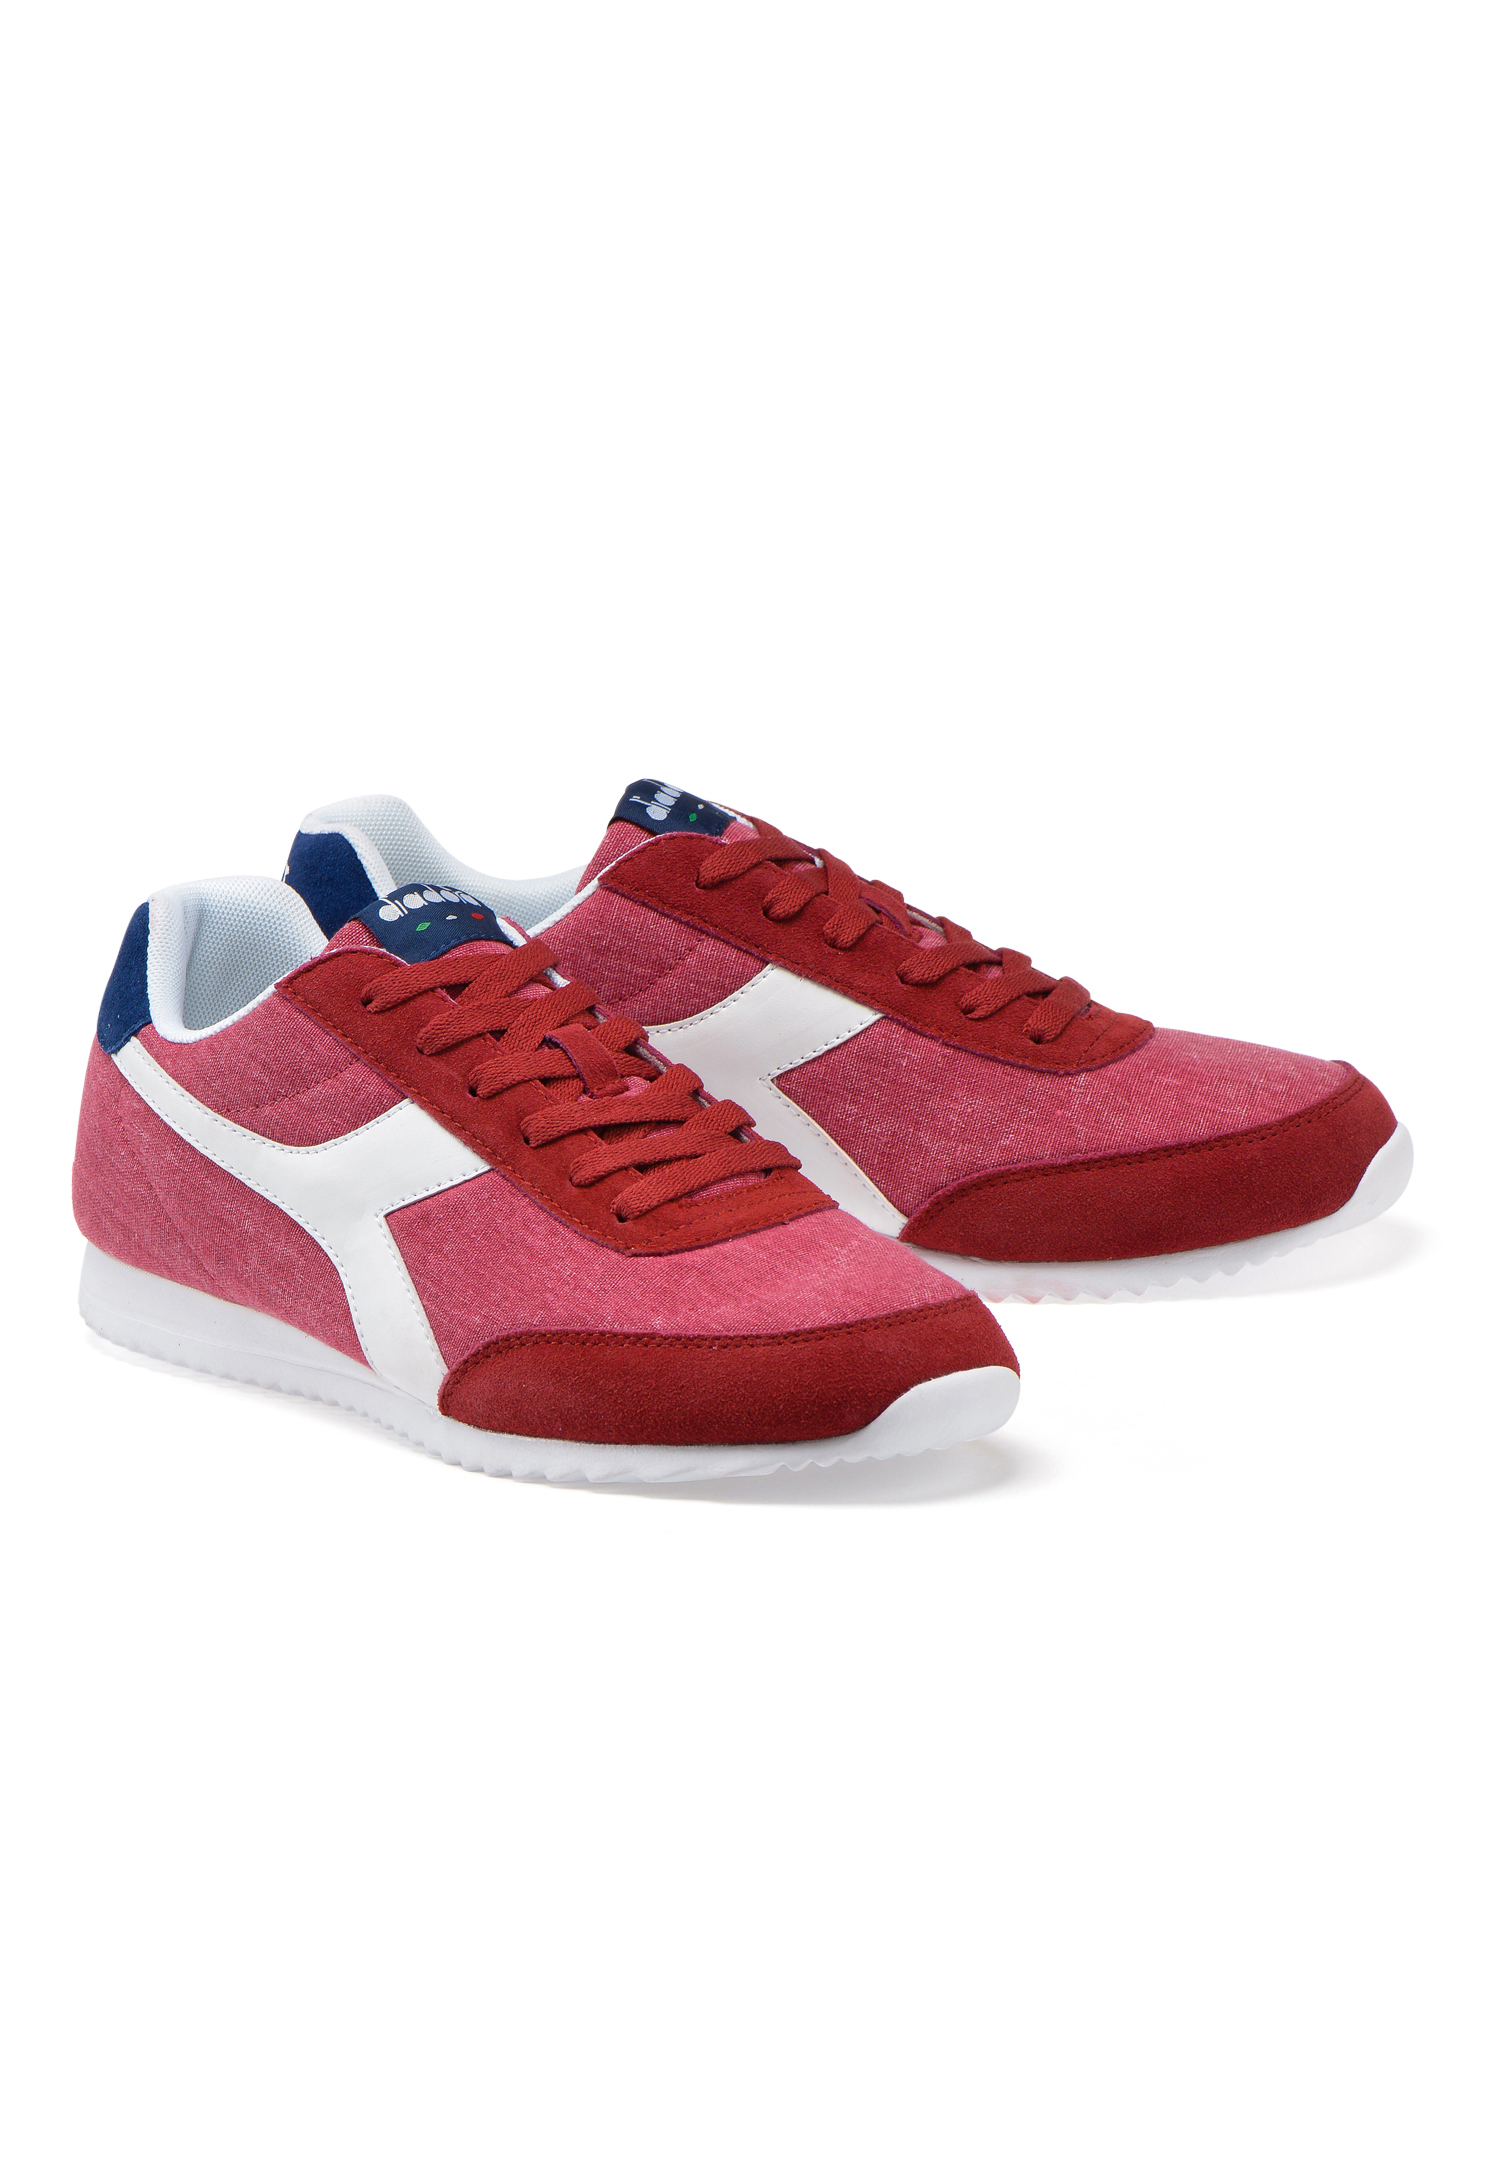 Scarpe-Diadora-Jog-Light-C-Sneakers-sportive-uomo-donna-vari-colori-e-taglie miniatura 12